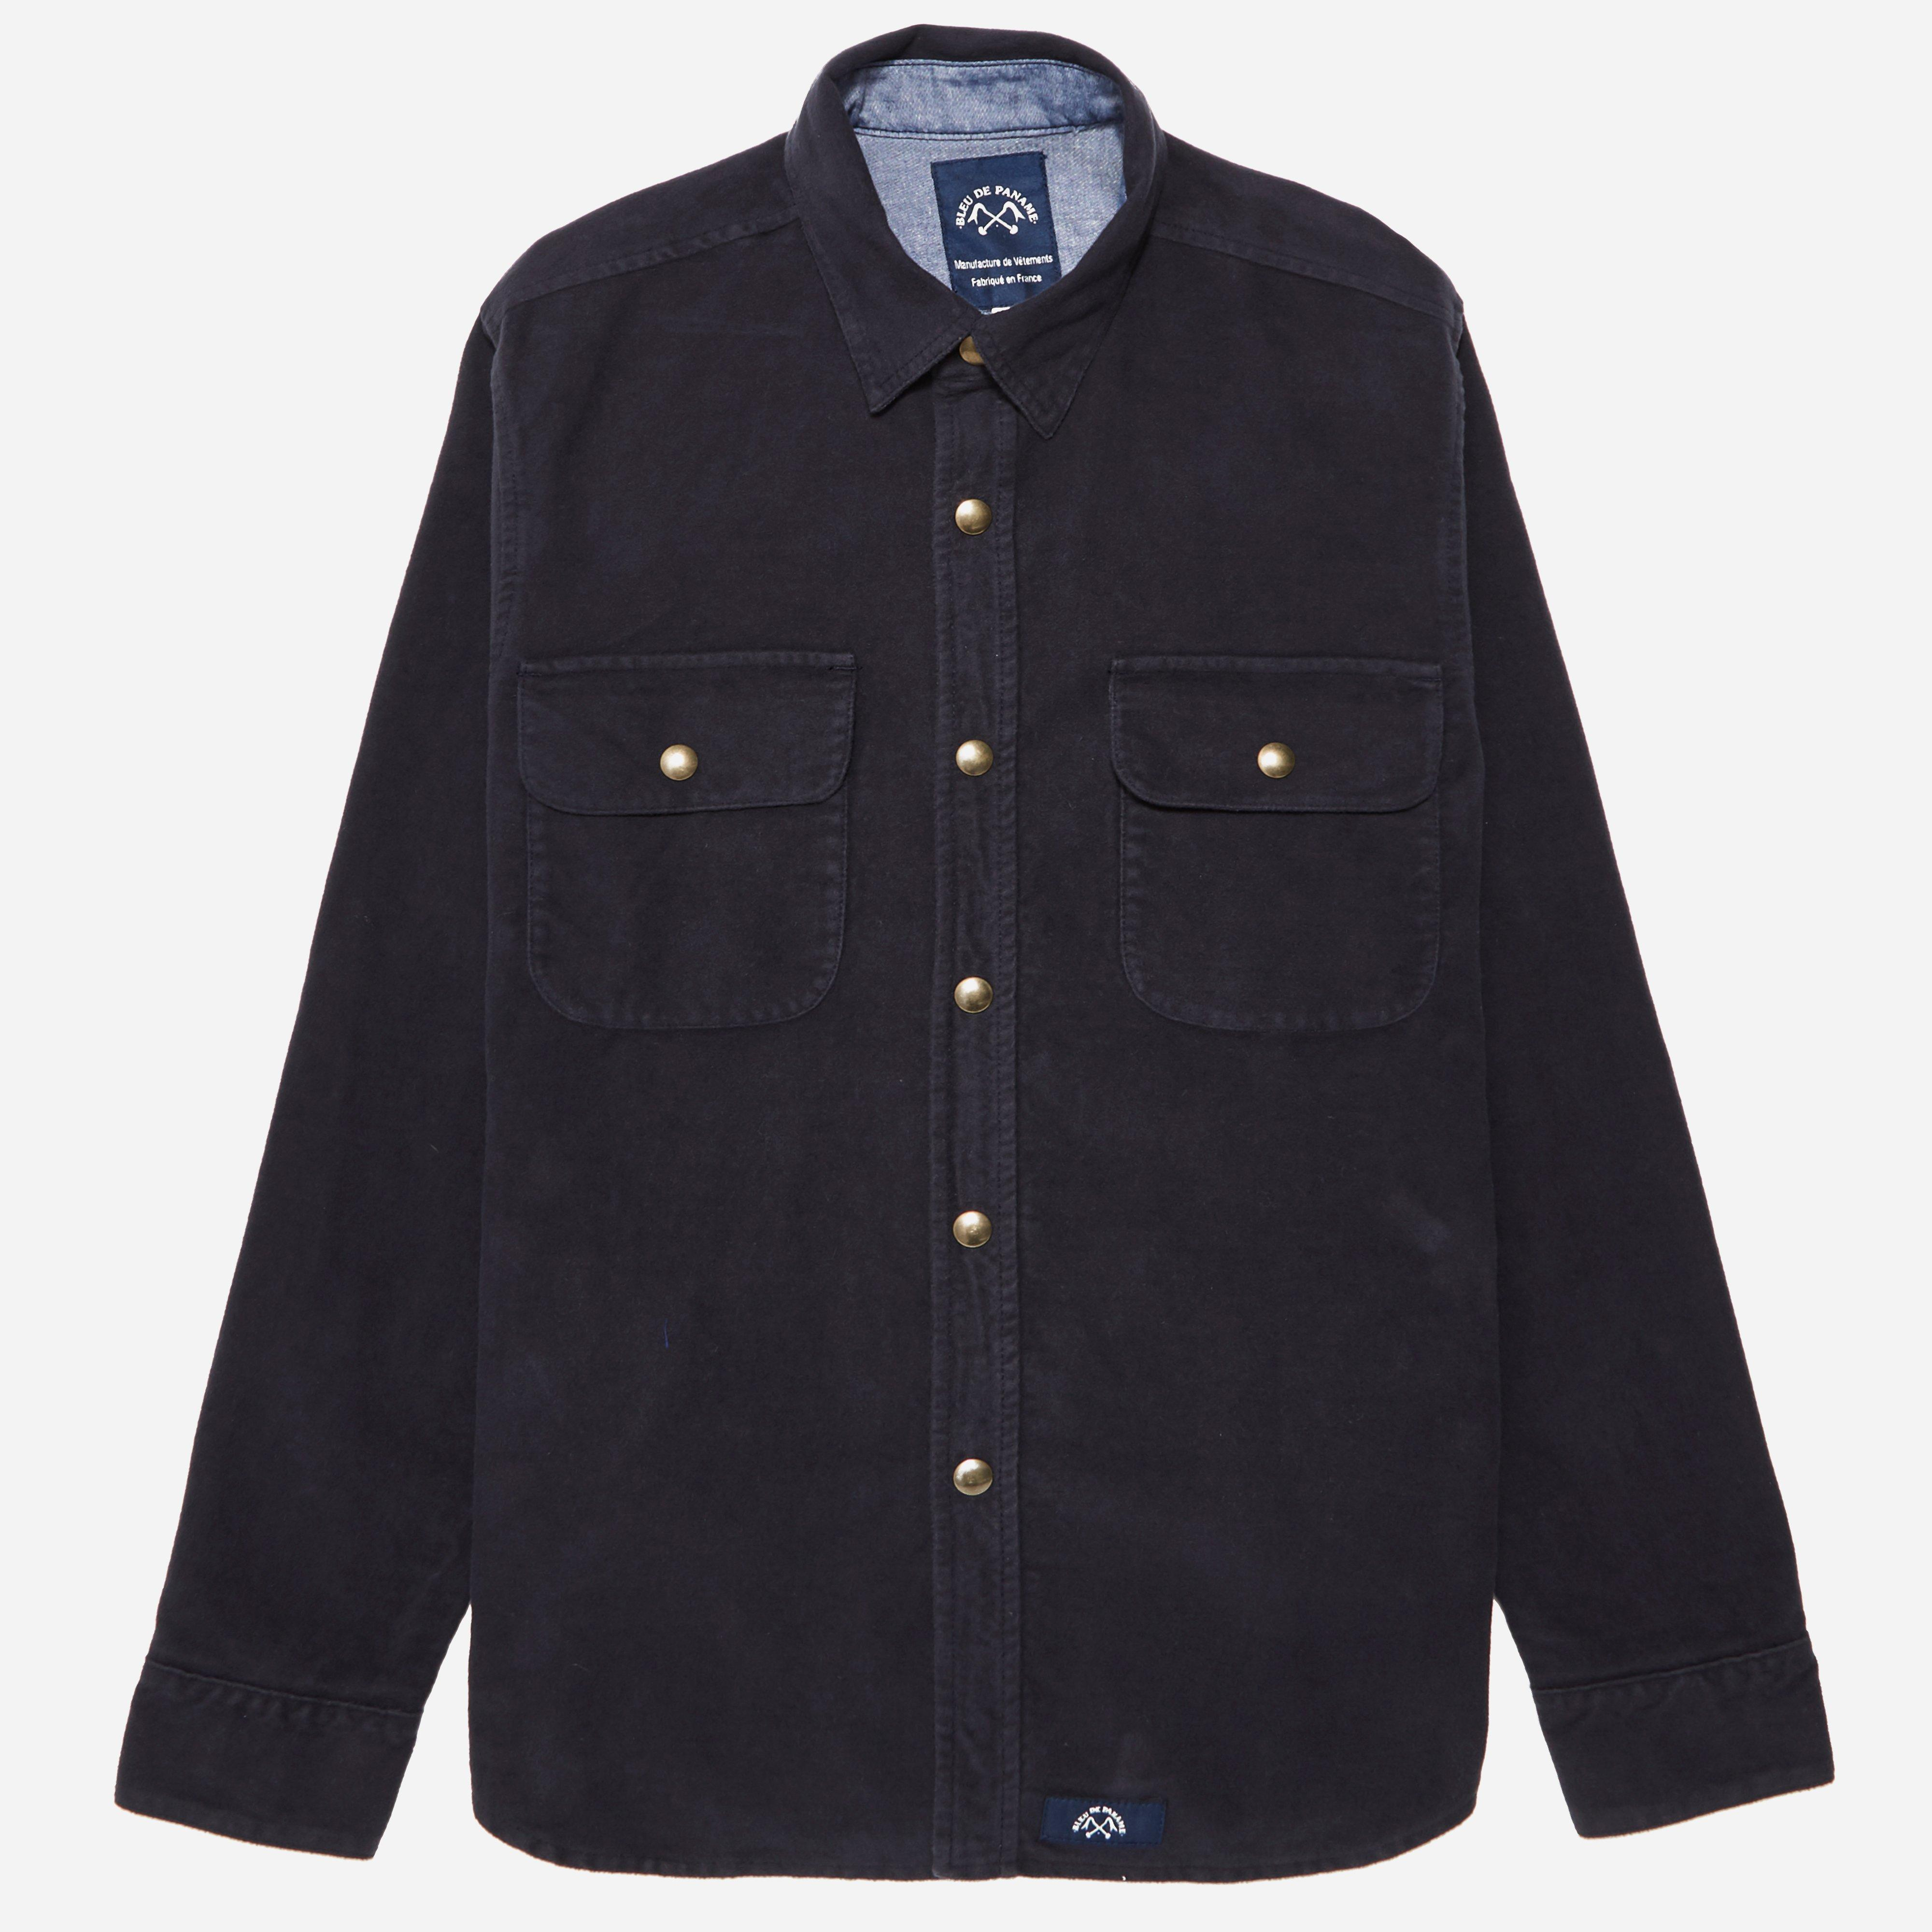 Bleu De Paname Tankiste Shirt